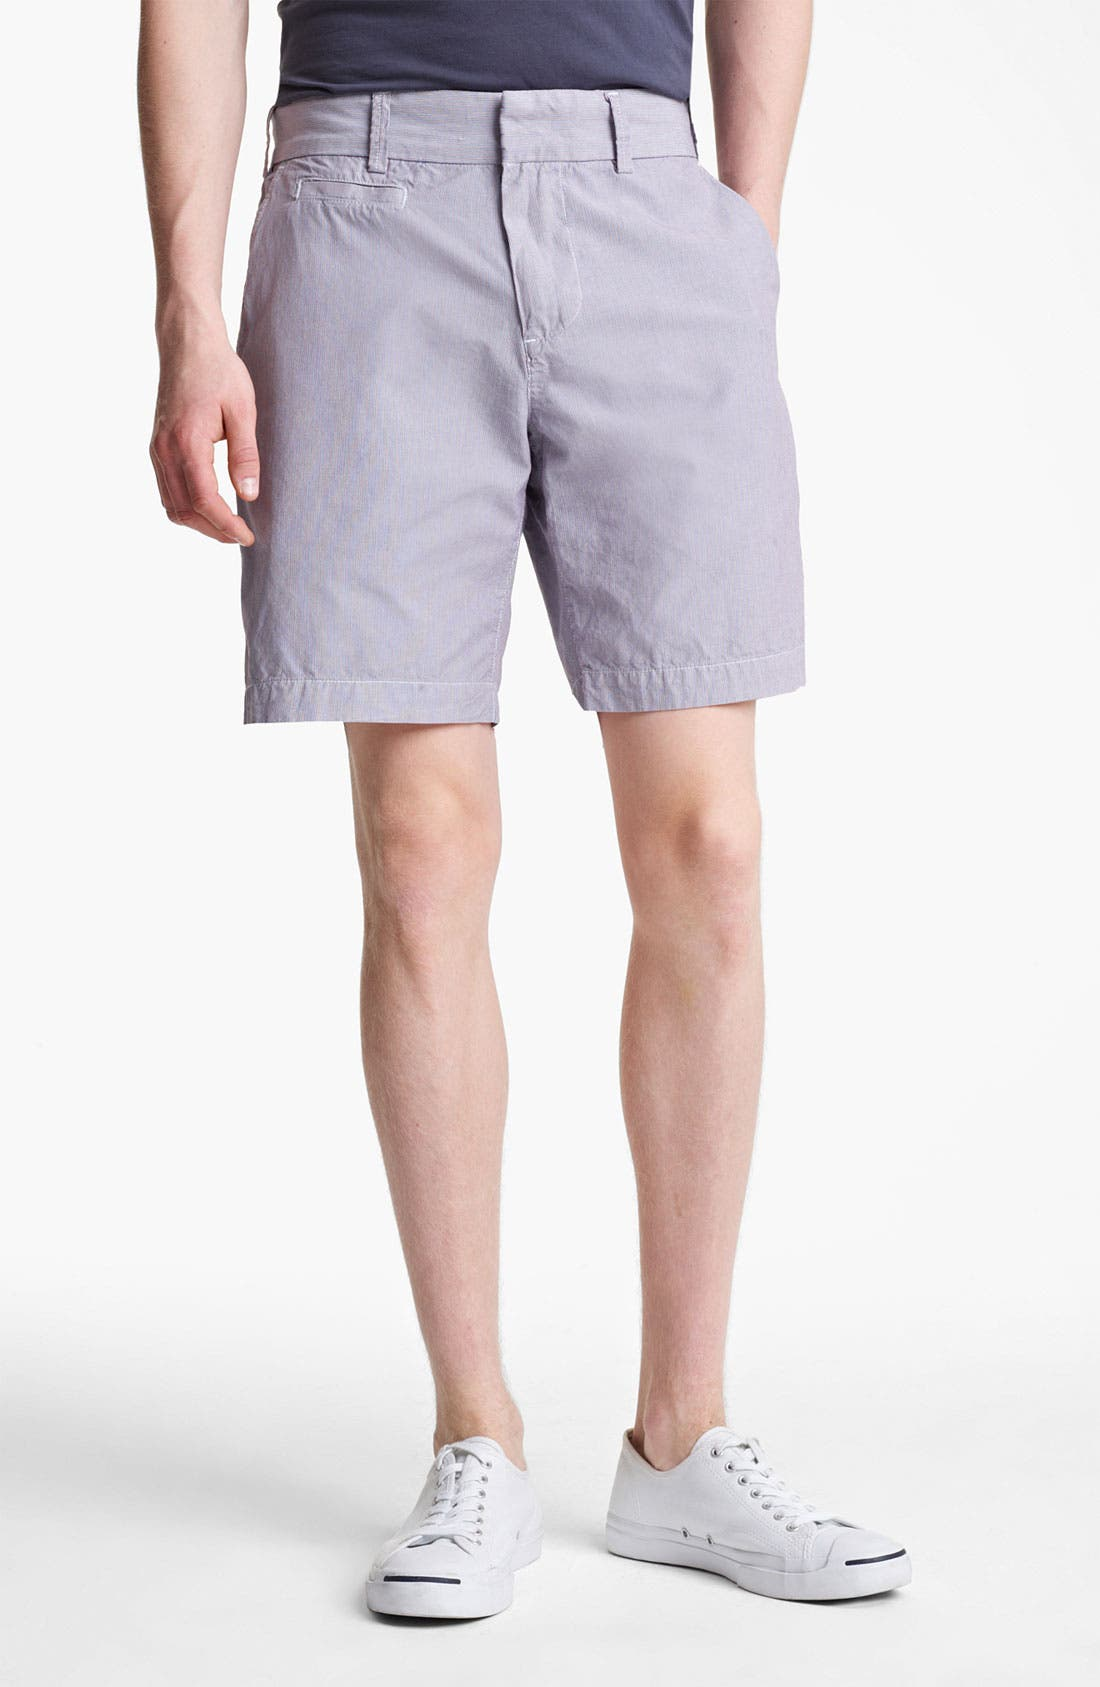 Alternate Image 1 Selected - Save Khaki Microstripe Bermuda Shorts